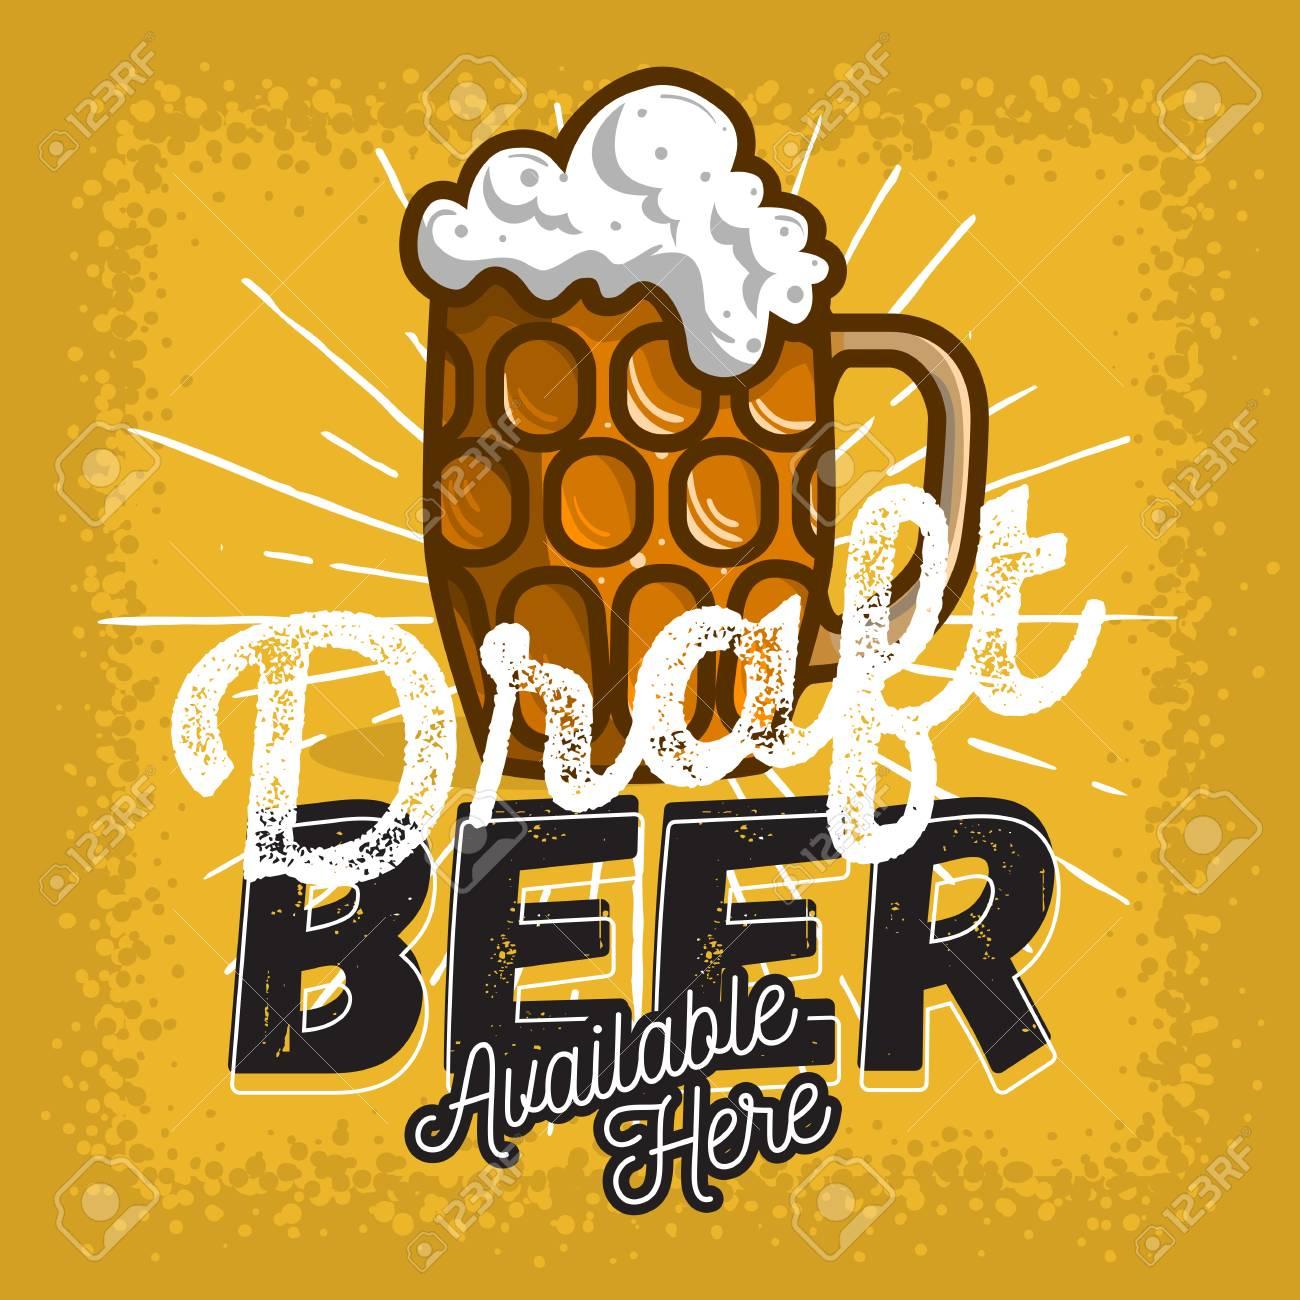 Glass Mug Of Draft Beer With Foam Poster Sign Design For Promotion Vector Image